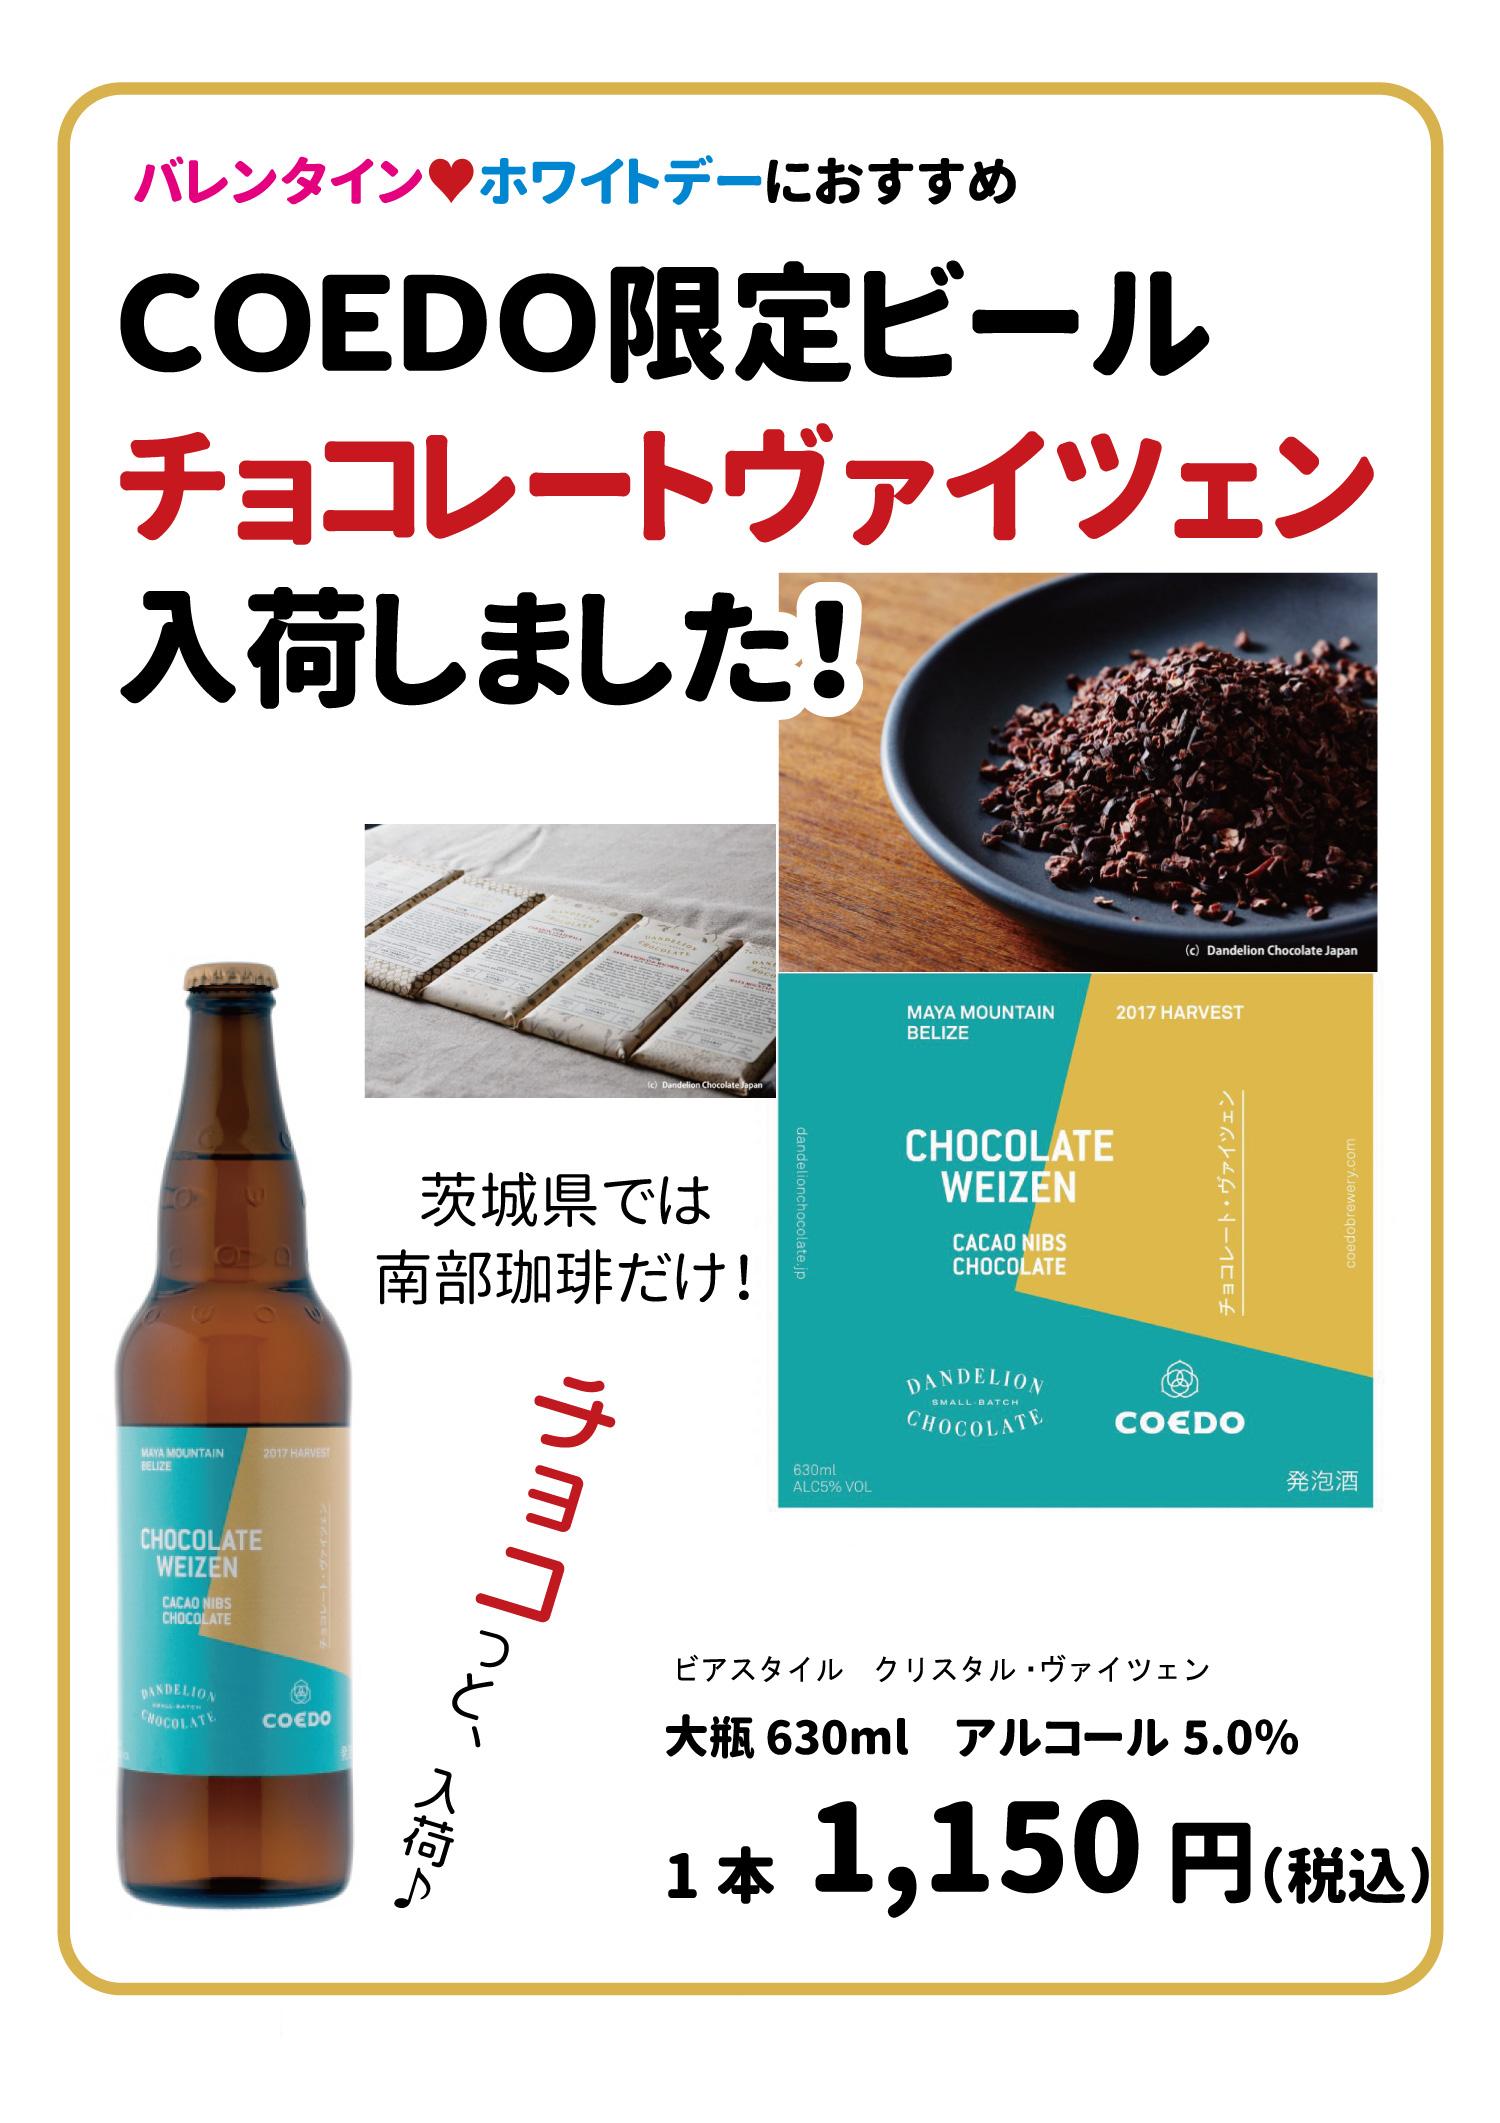 COEDO限定ビールチョコレートヴァイツェン